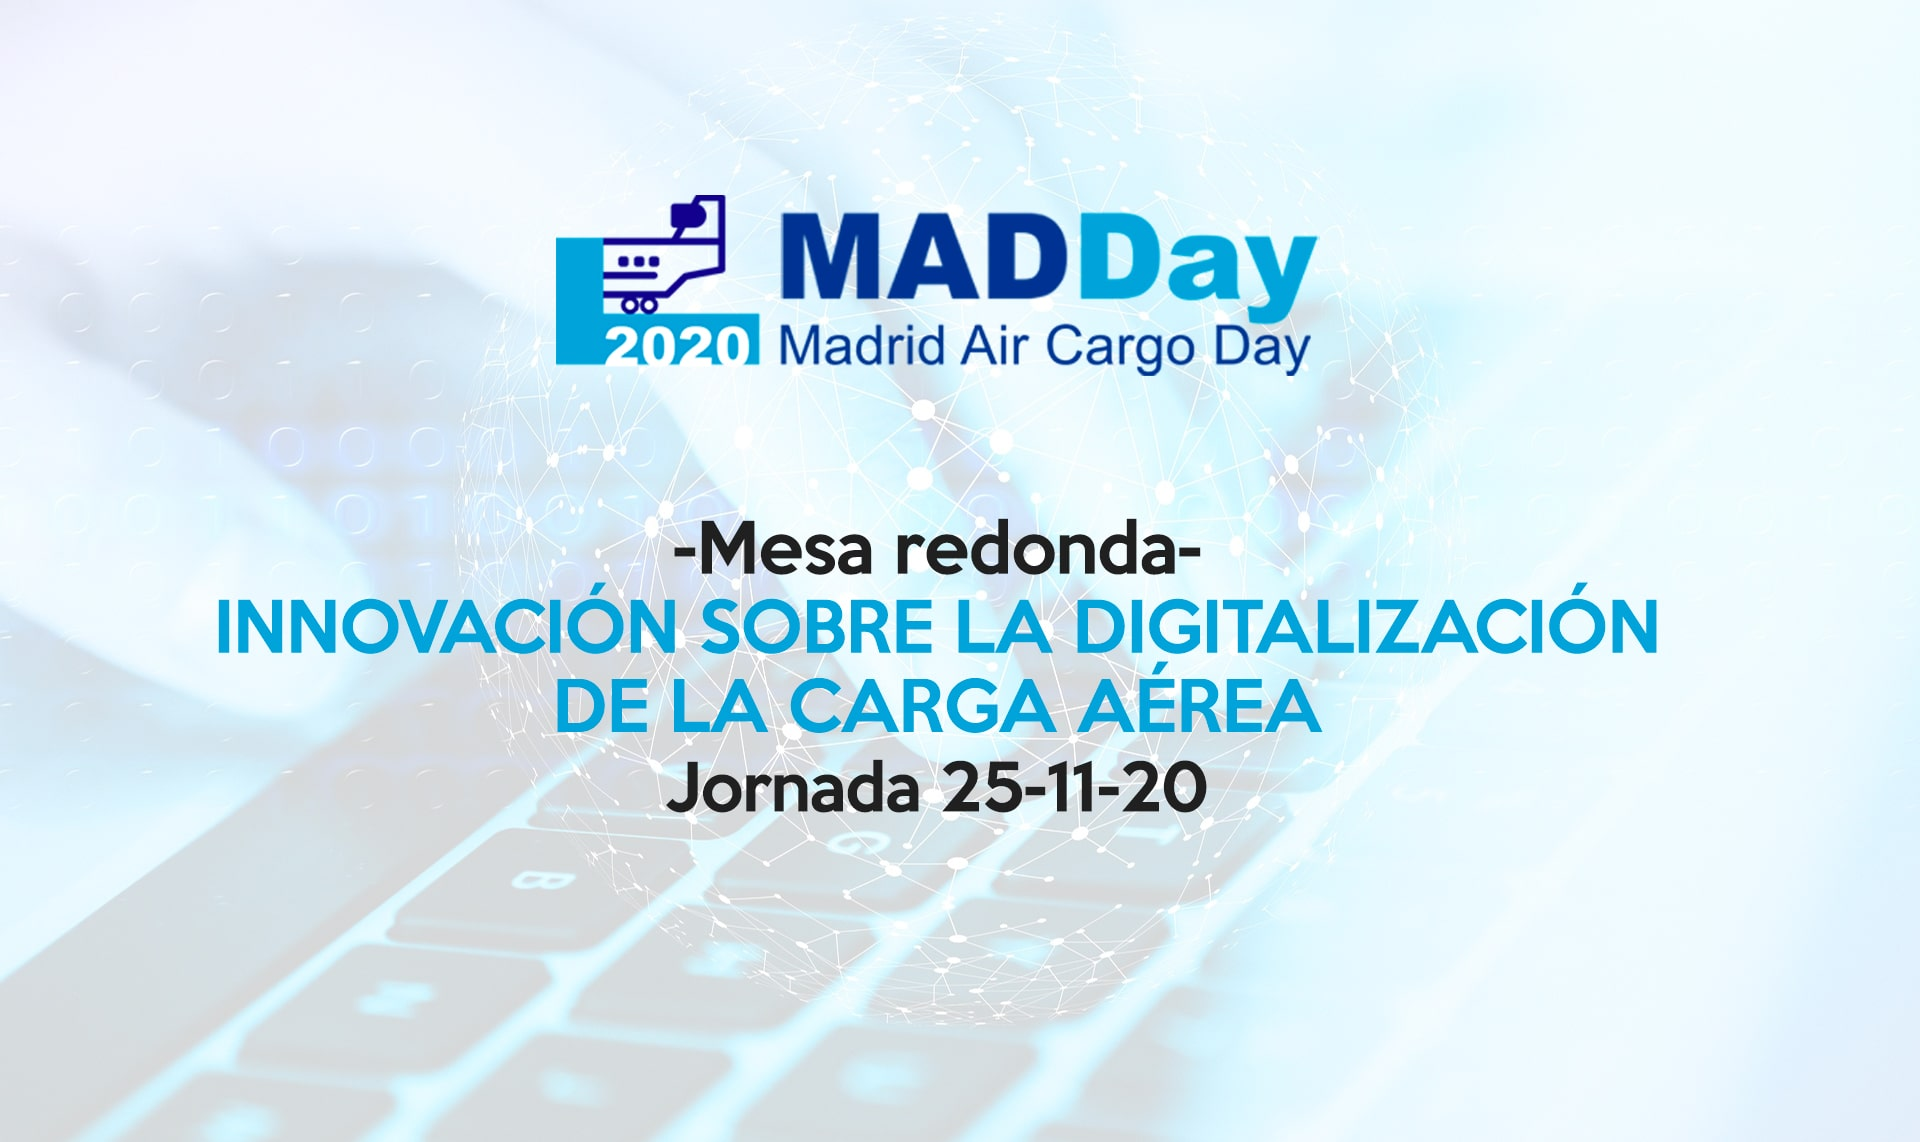 Madrid Air Cargo Day 2020 - Mesa redonda